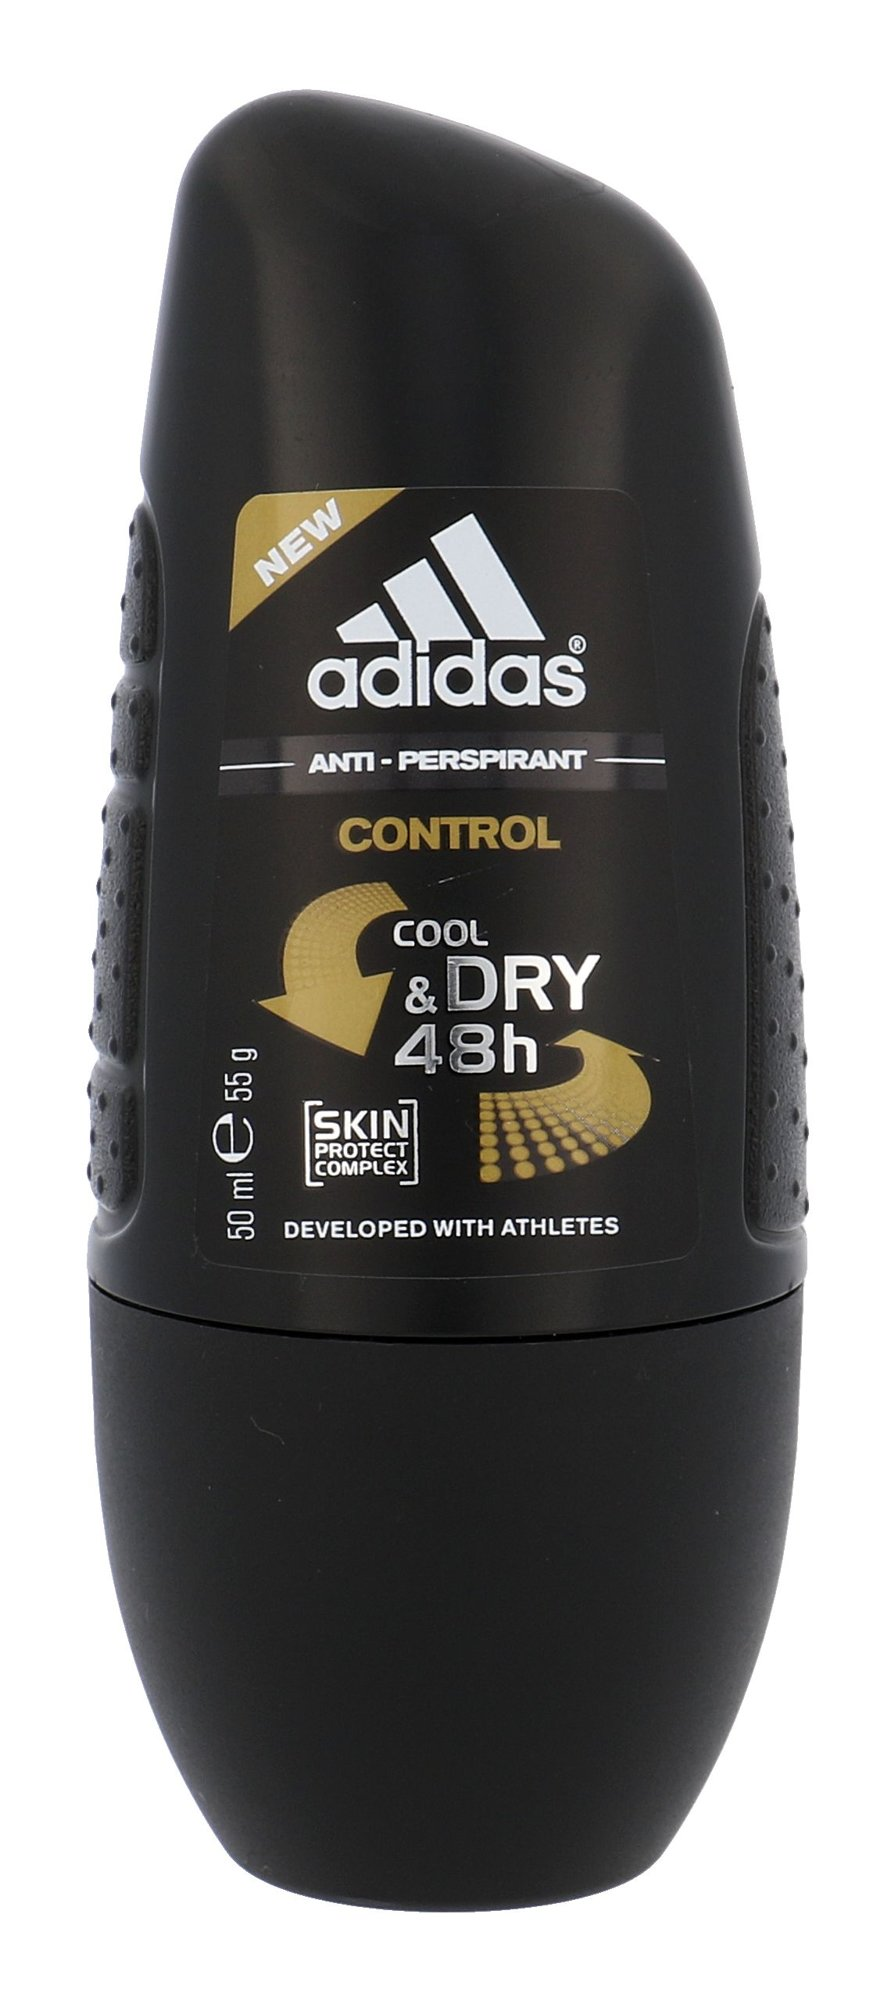 Adidas Control Deo Rollon 50ml